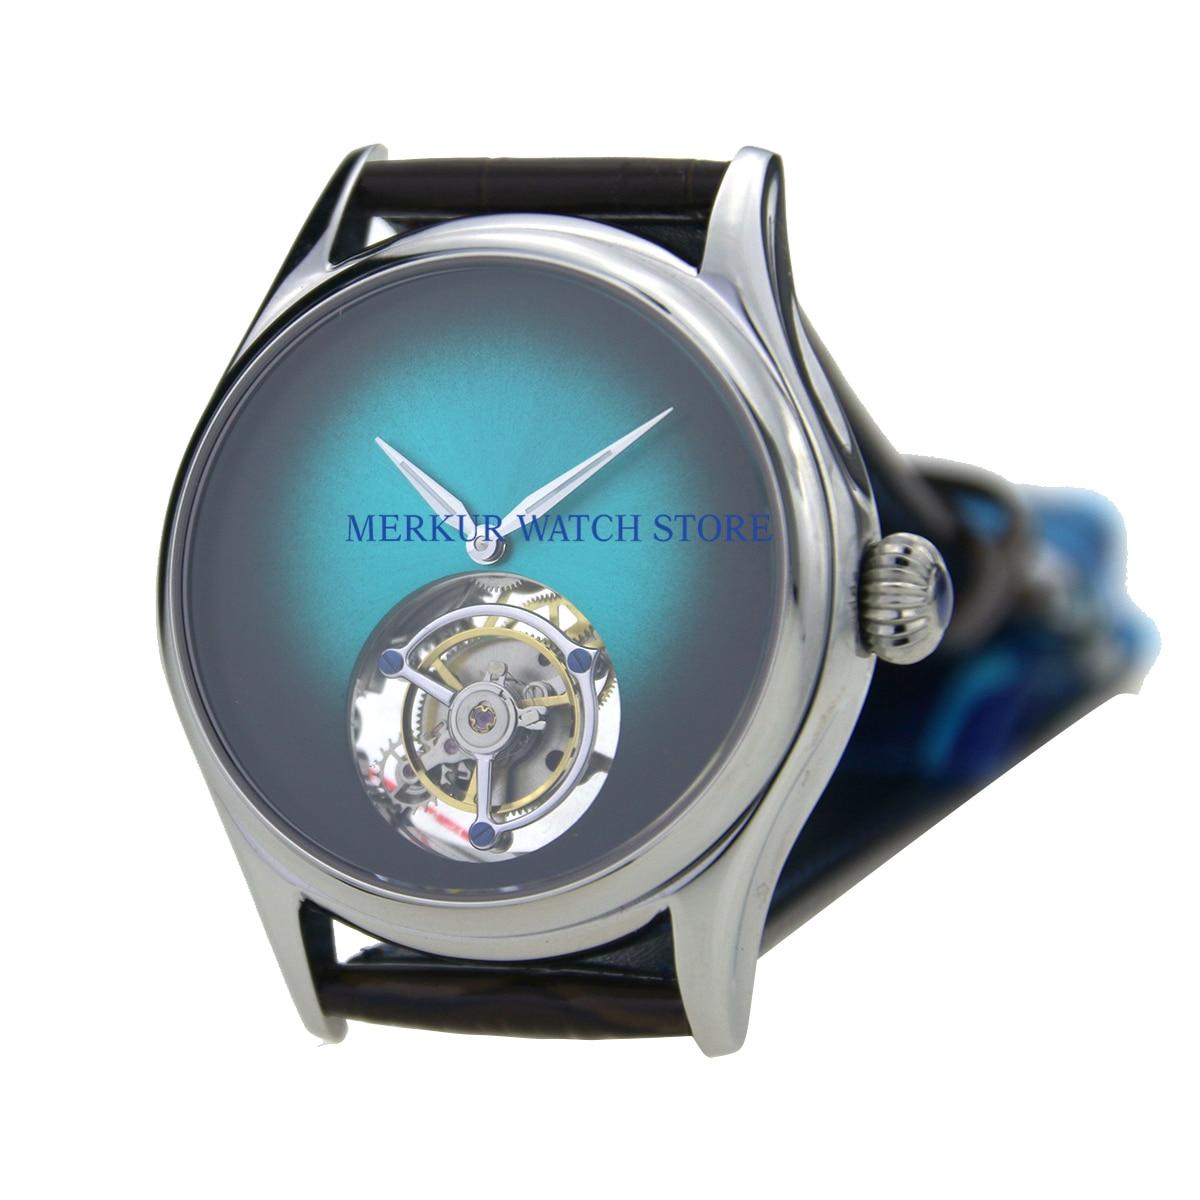 Sugess, reloj para hombre, gaviota mecánica Hangzhou, movimiento alto Beat Tourbillon, skelyton, vestido de lujo, verde degradado